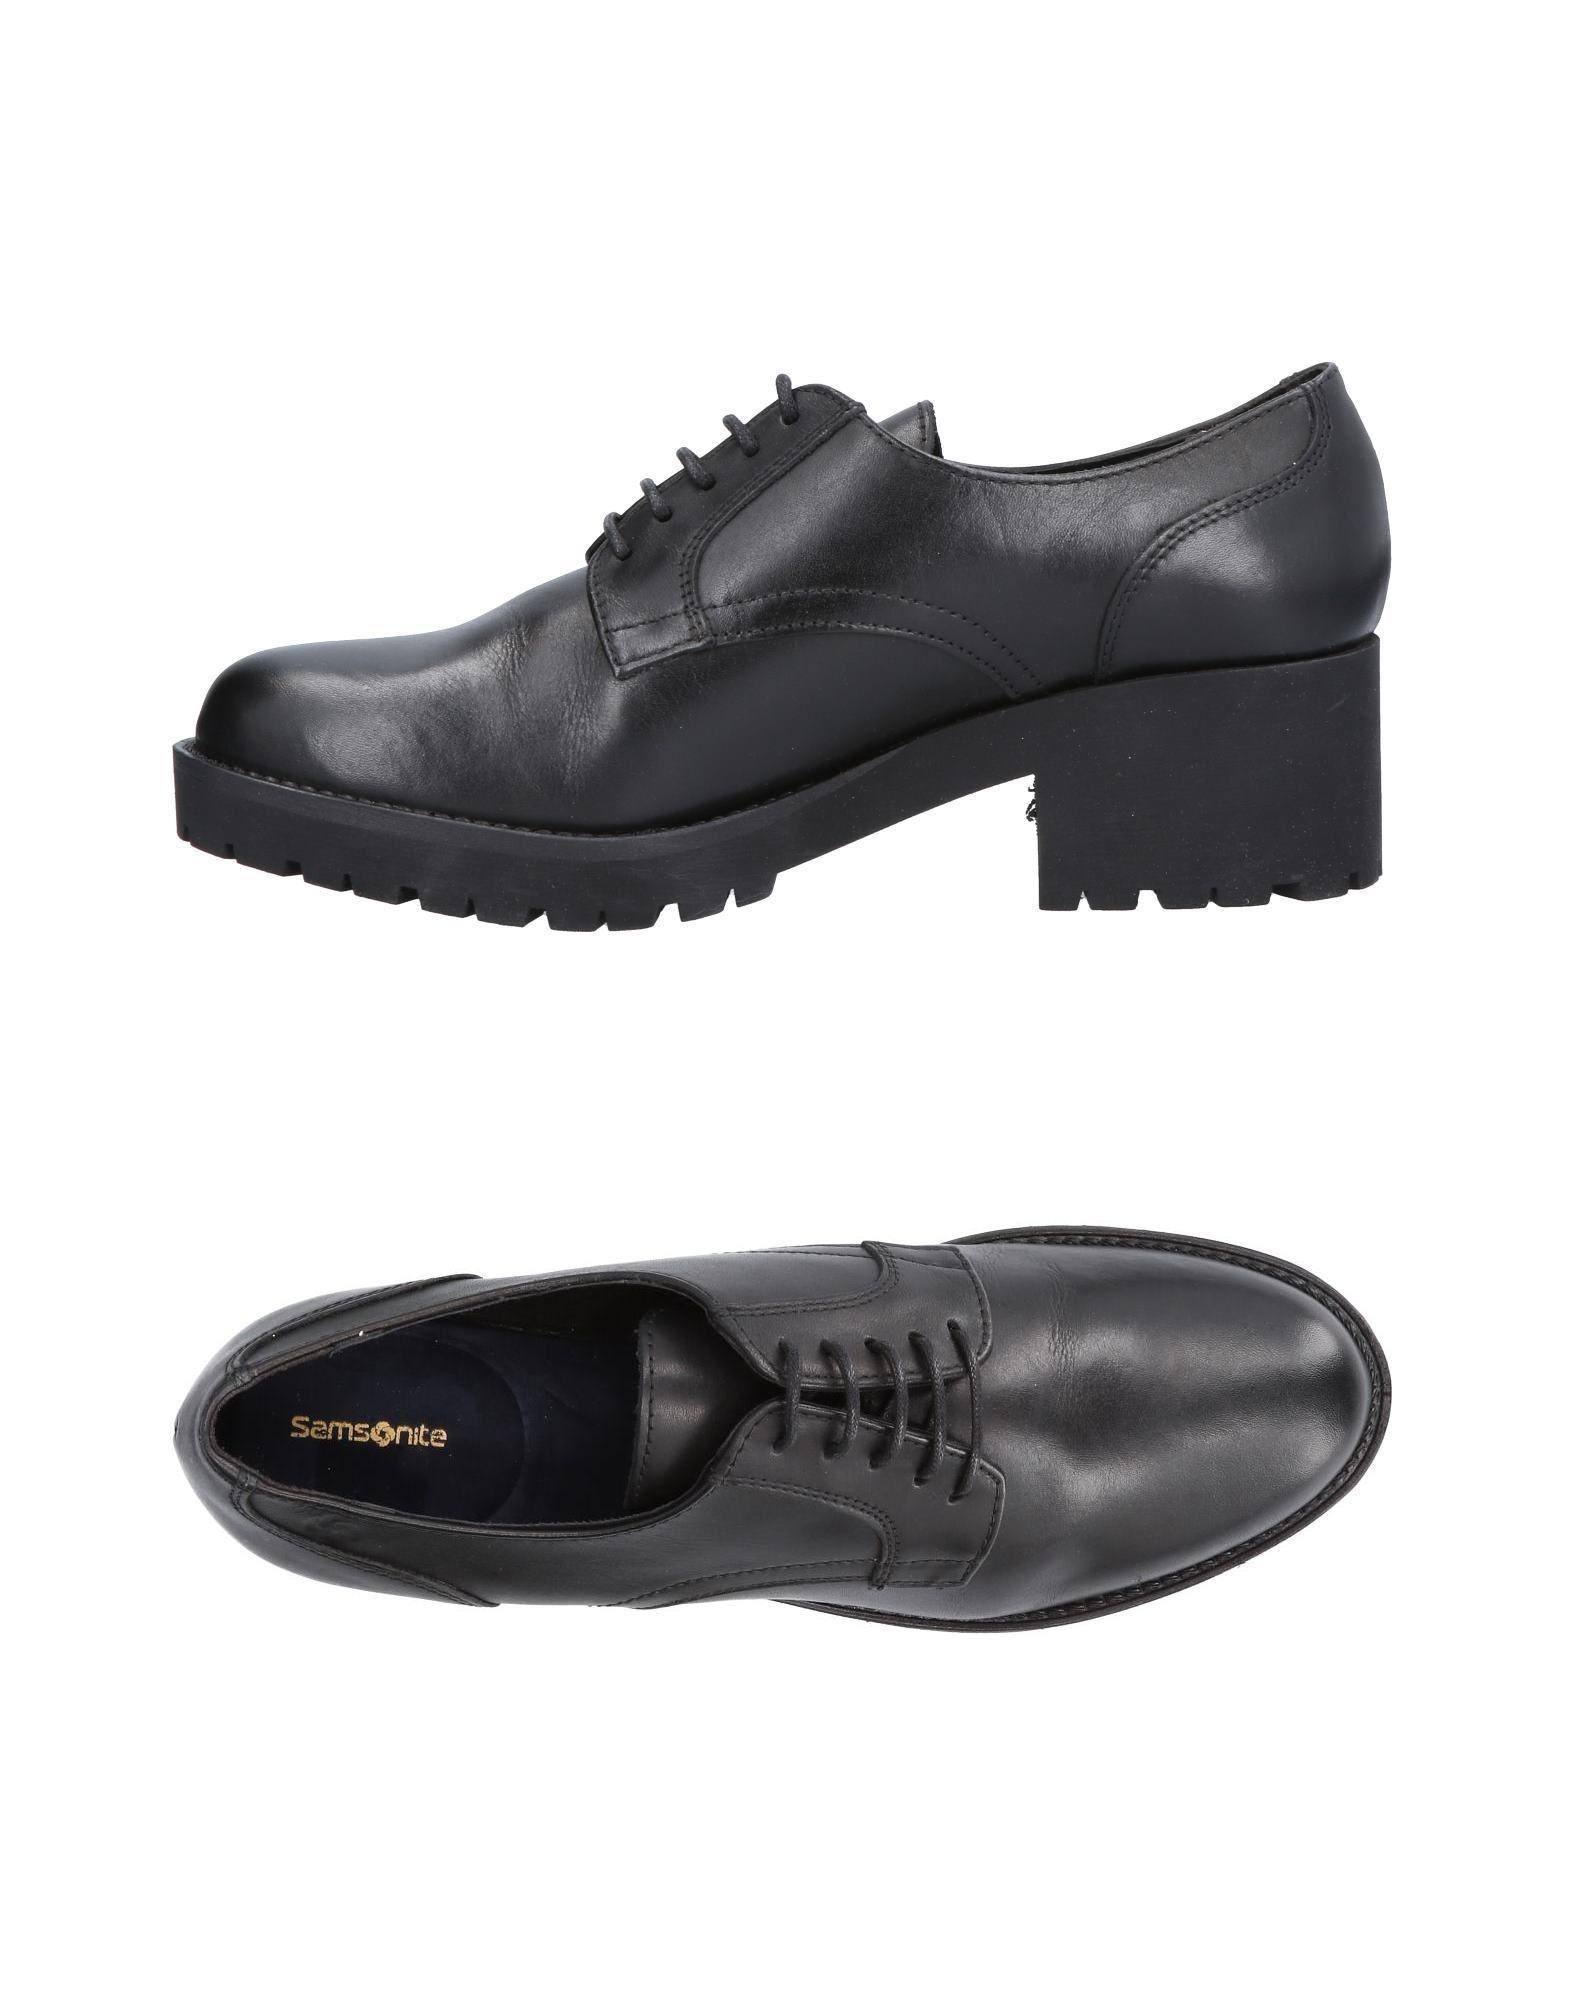 Samsonite Chaussures À Lacets ZfZAsF